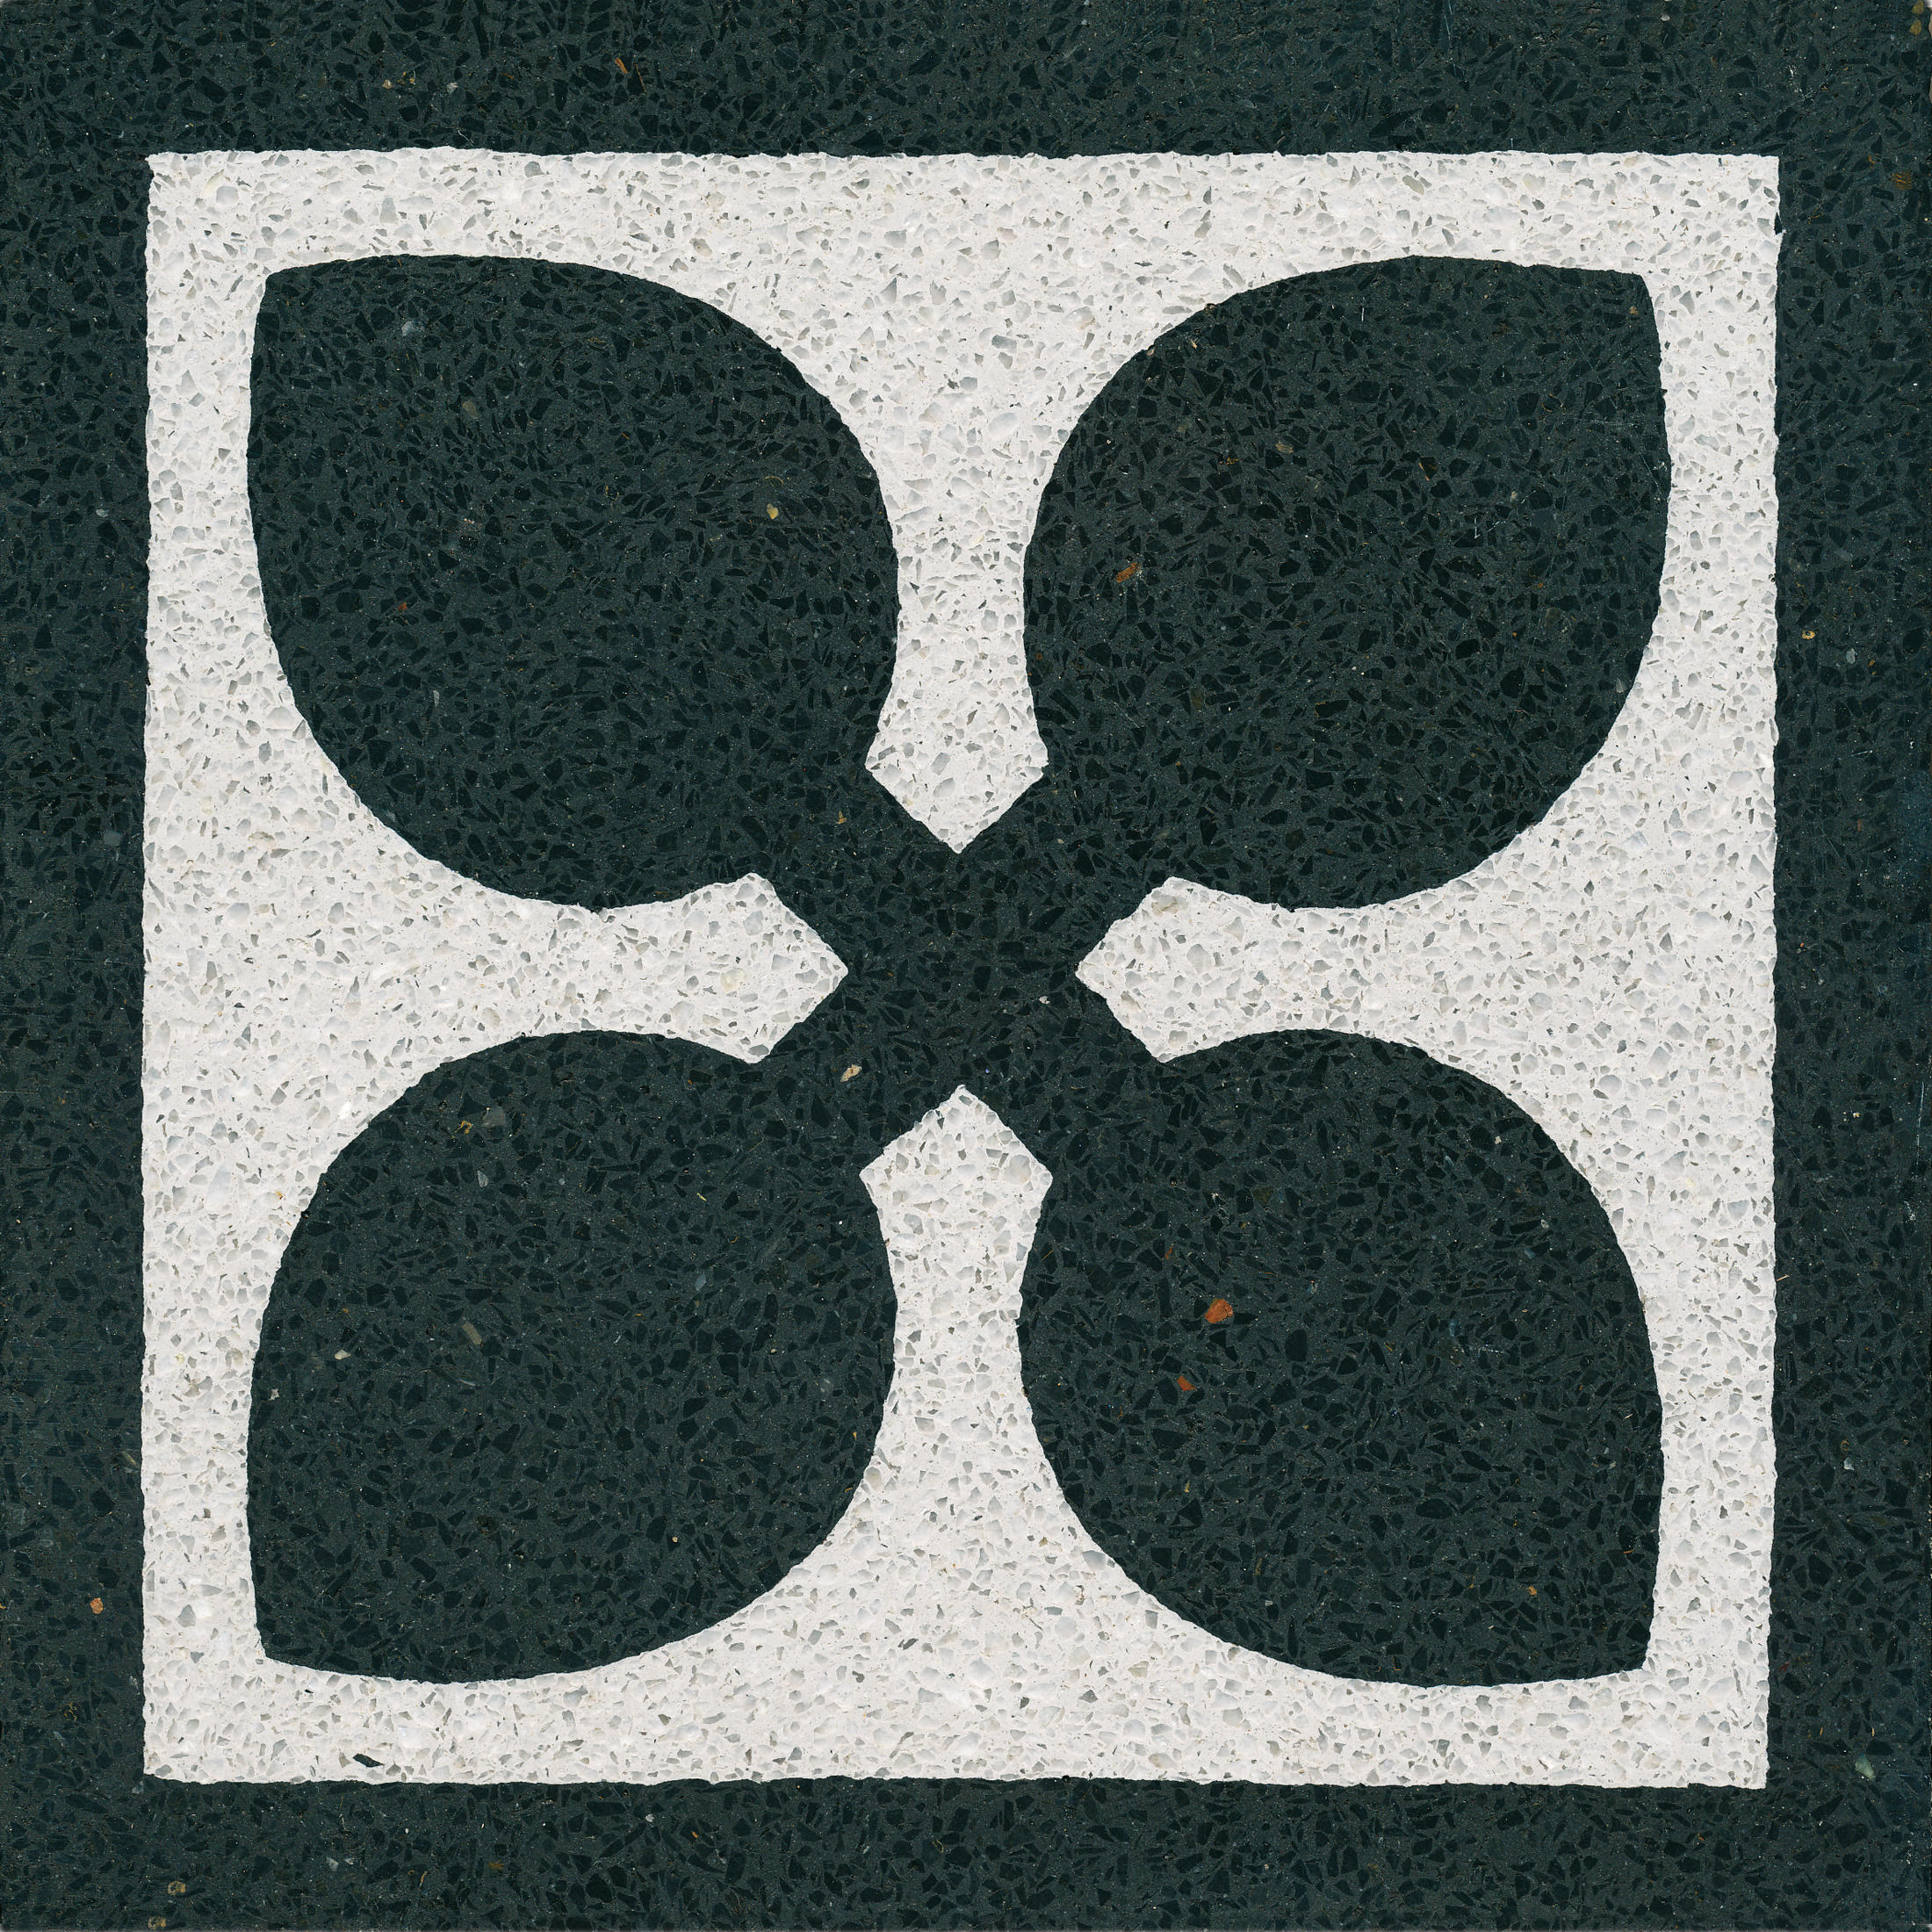 TERRAZZO TILE - Terrazzo tiles from VIA | Architonic